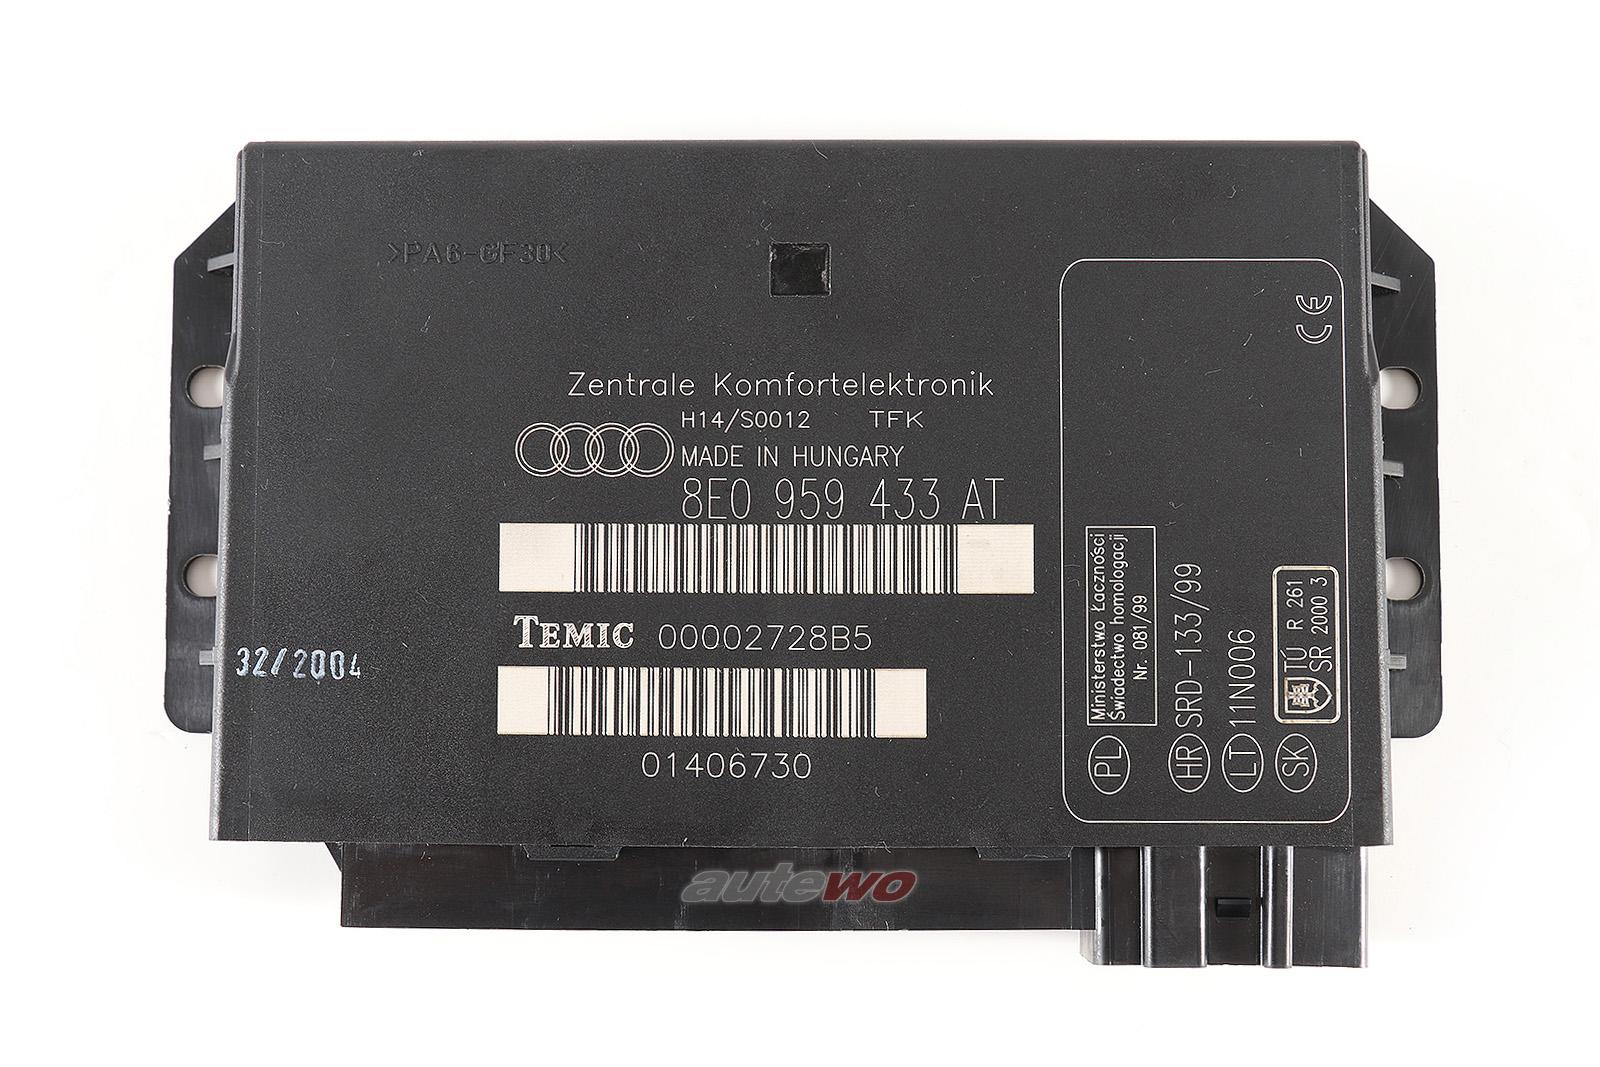 8E0959433AT Audi A4/S4 8E/B6 Zentralsteuergerät Komfortsystem